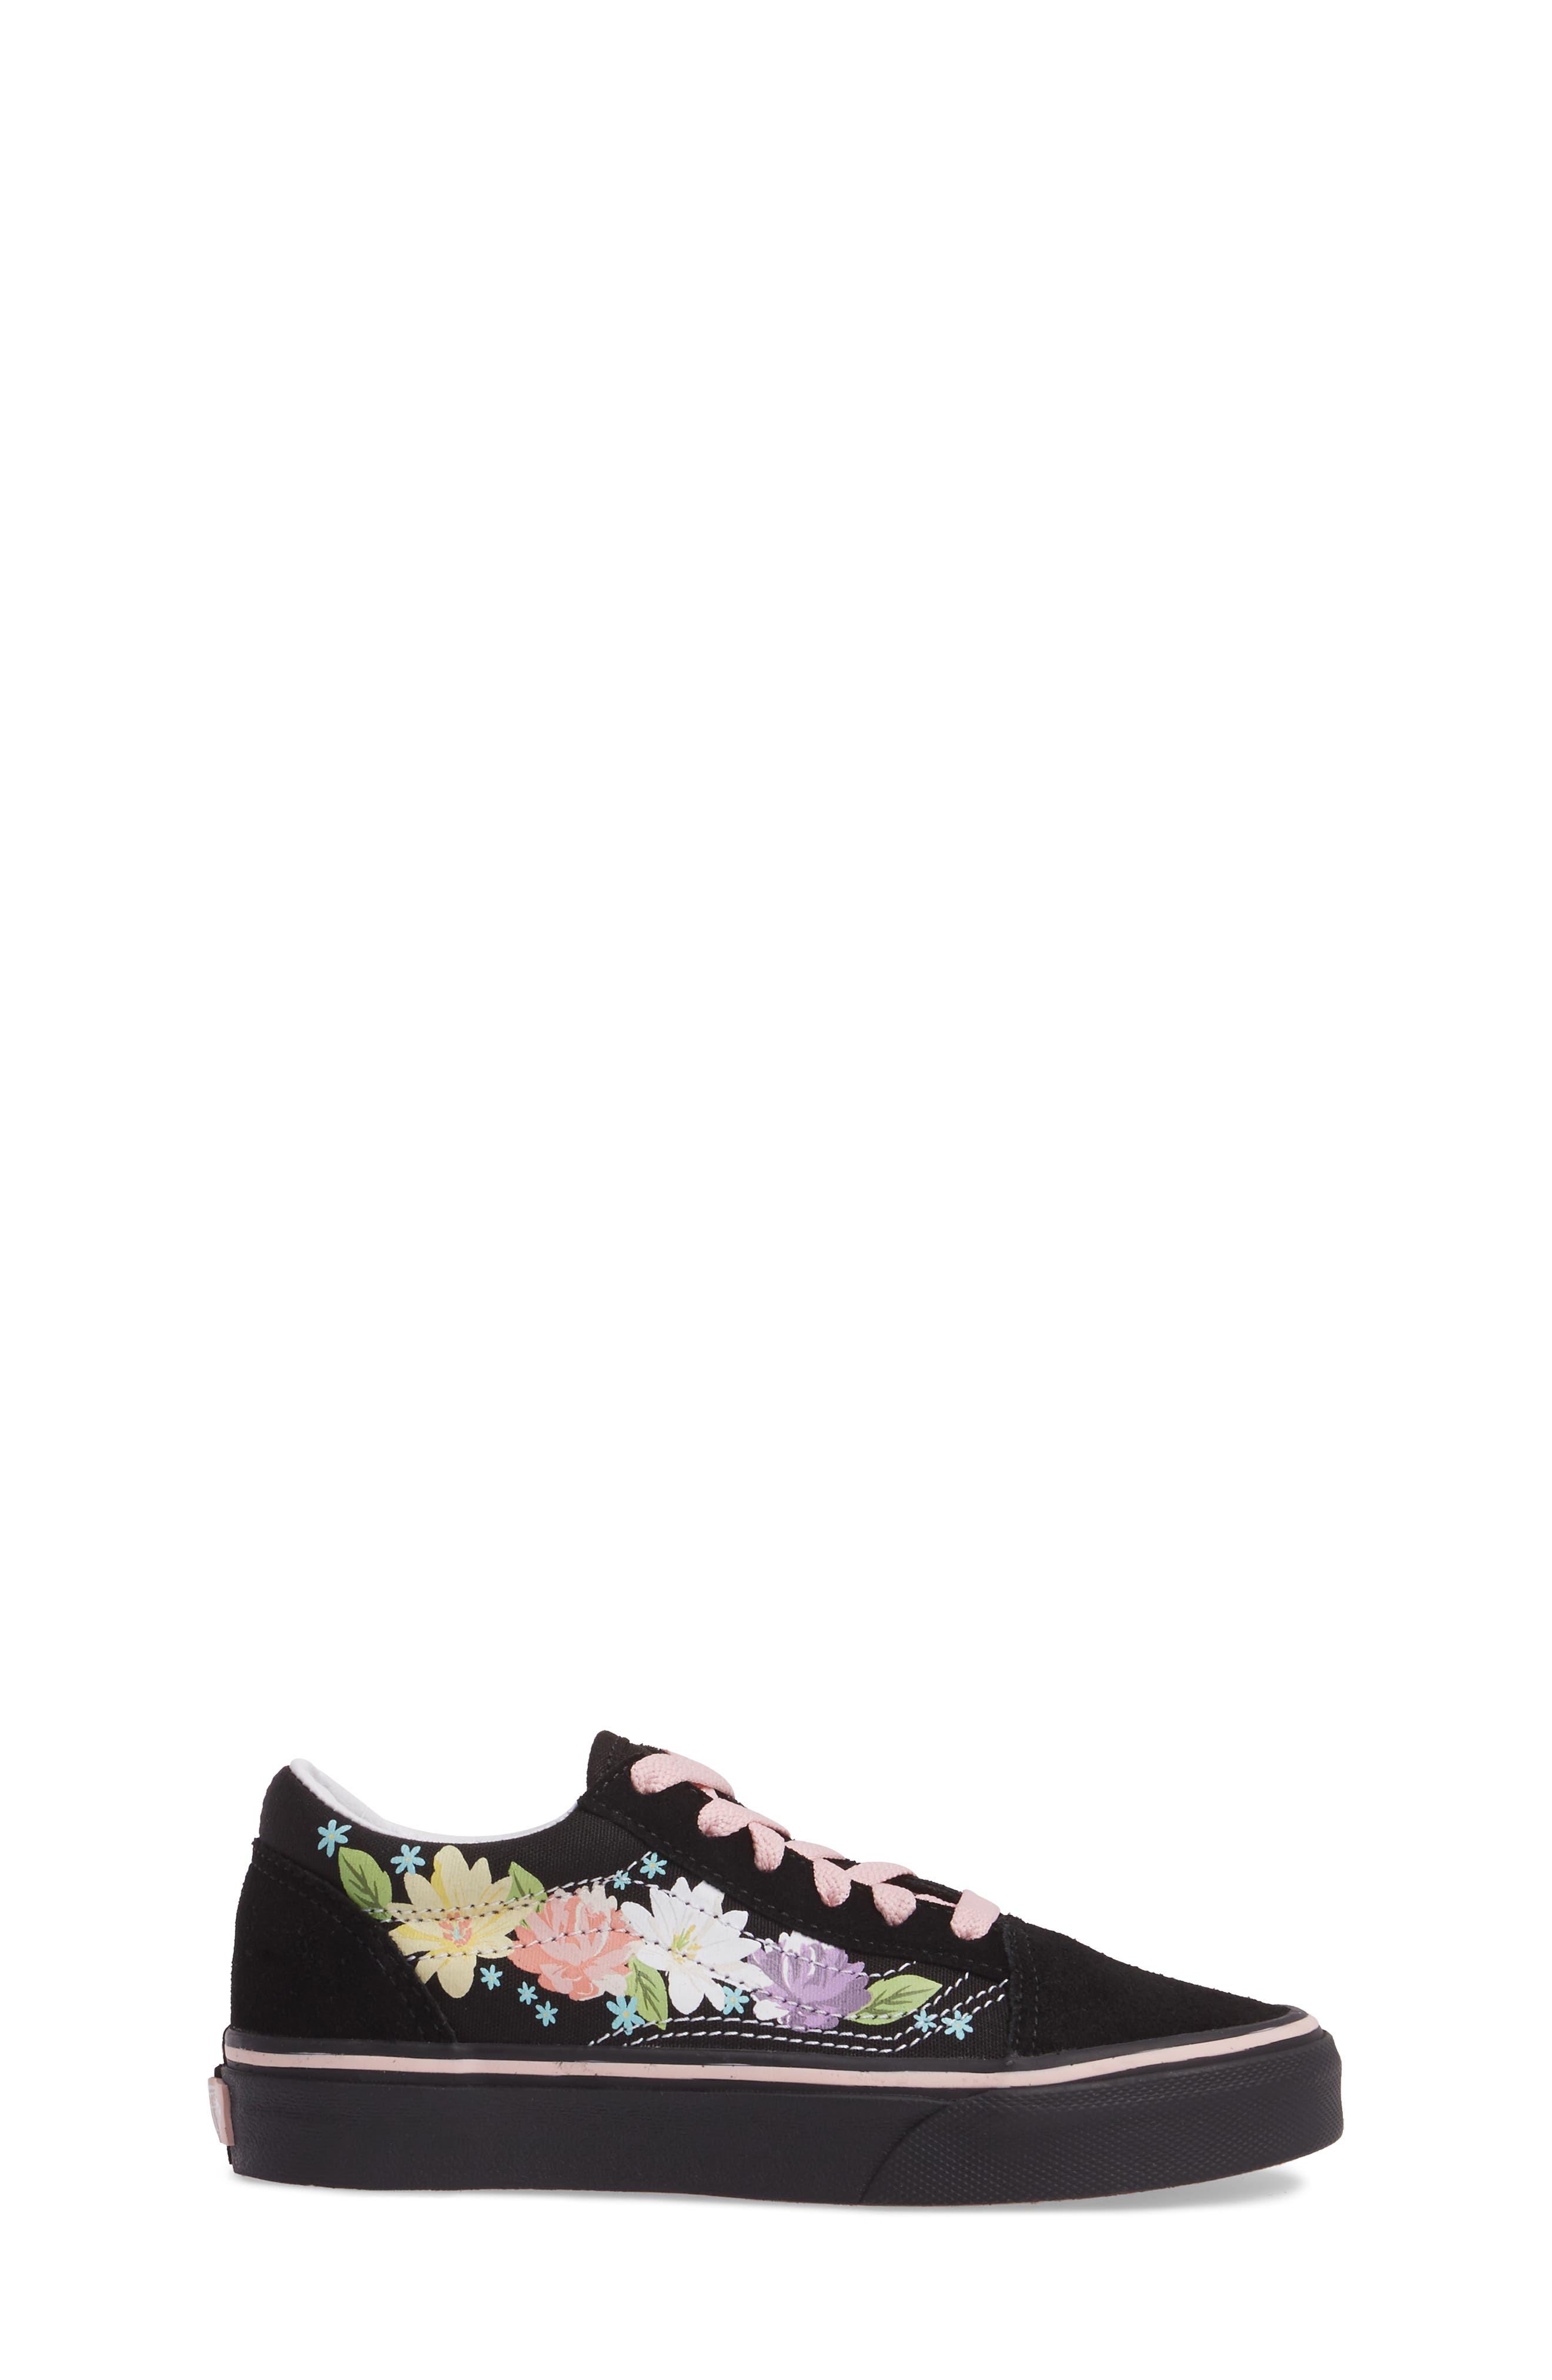 Old Skool Sneaker,                             Alternate thumbnail 3, color,